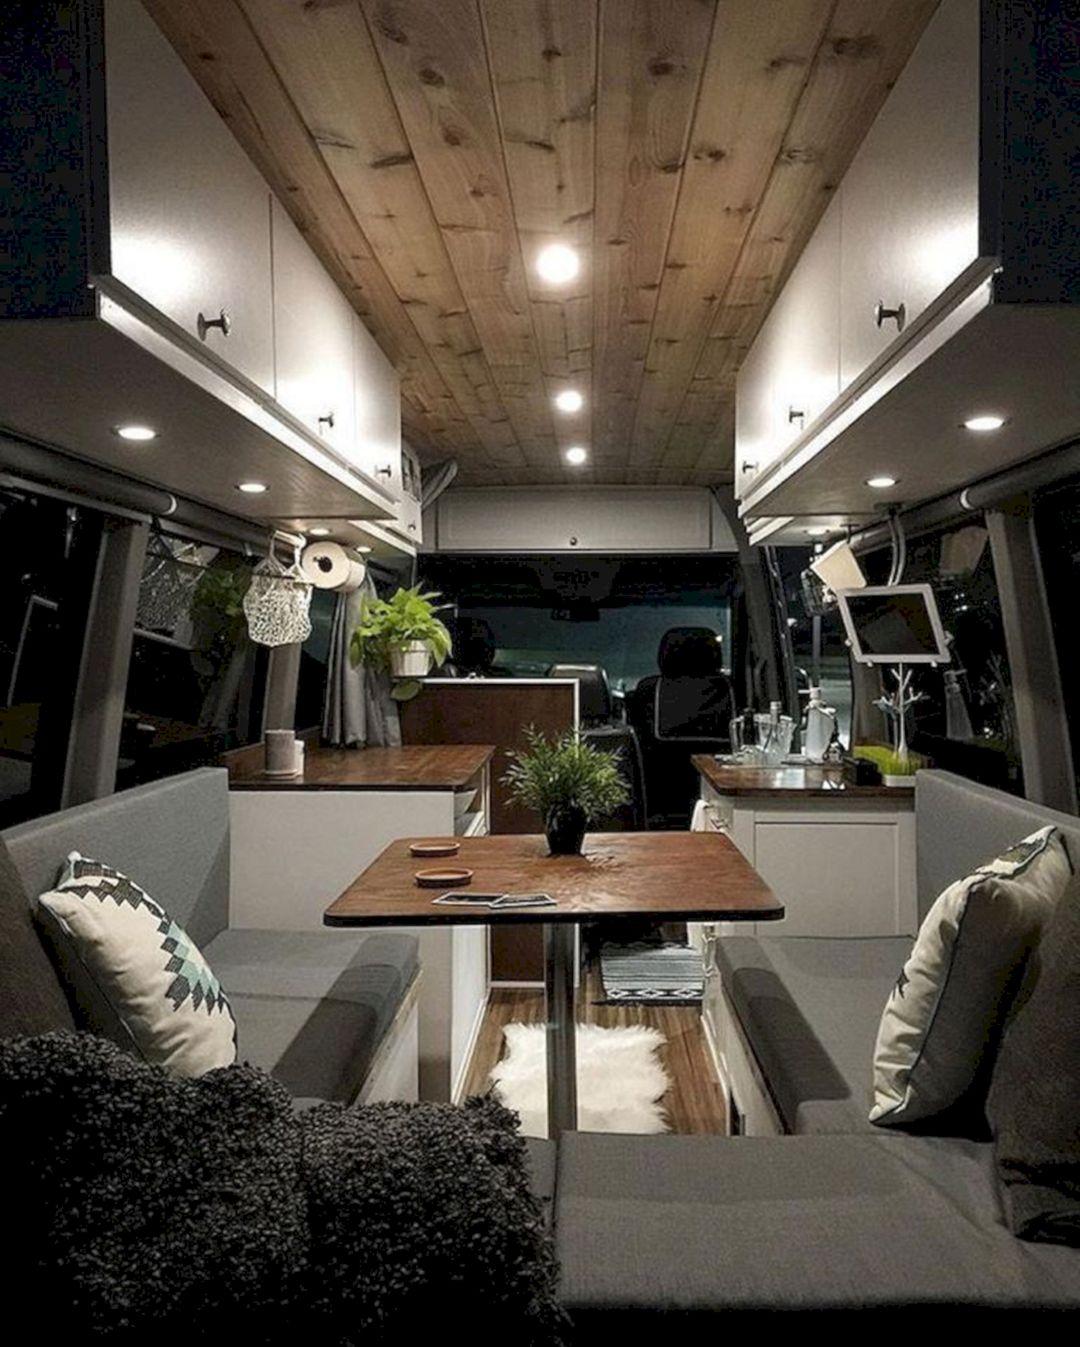 Best RV Camper Style